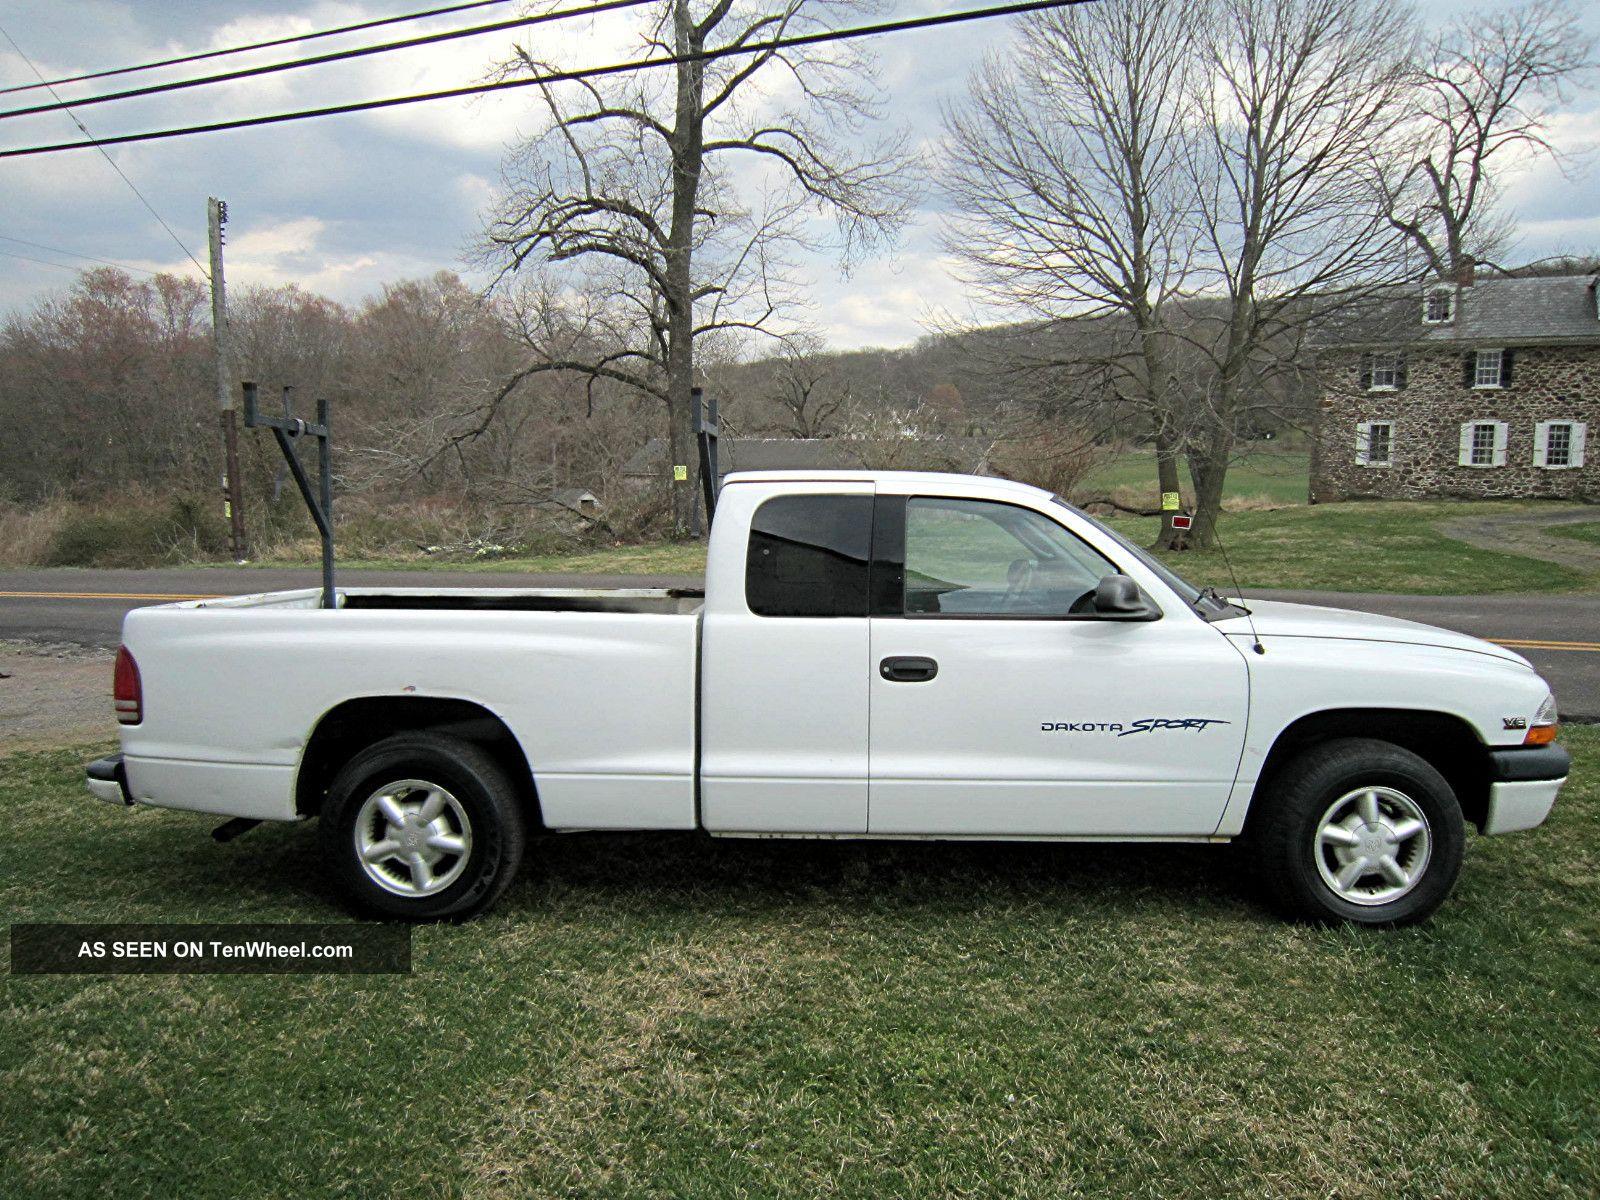 Dodge Dakota Sport With Wheel Drive And Stretch Cab Needs A Mechanic Lgw on White 2000 Dodge Dakota Sport